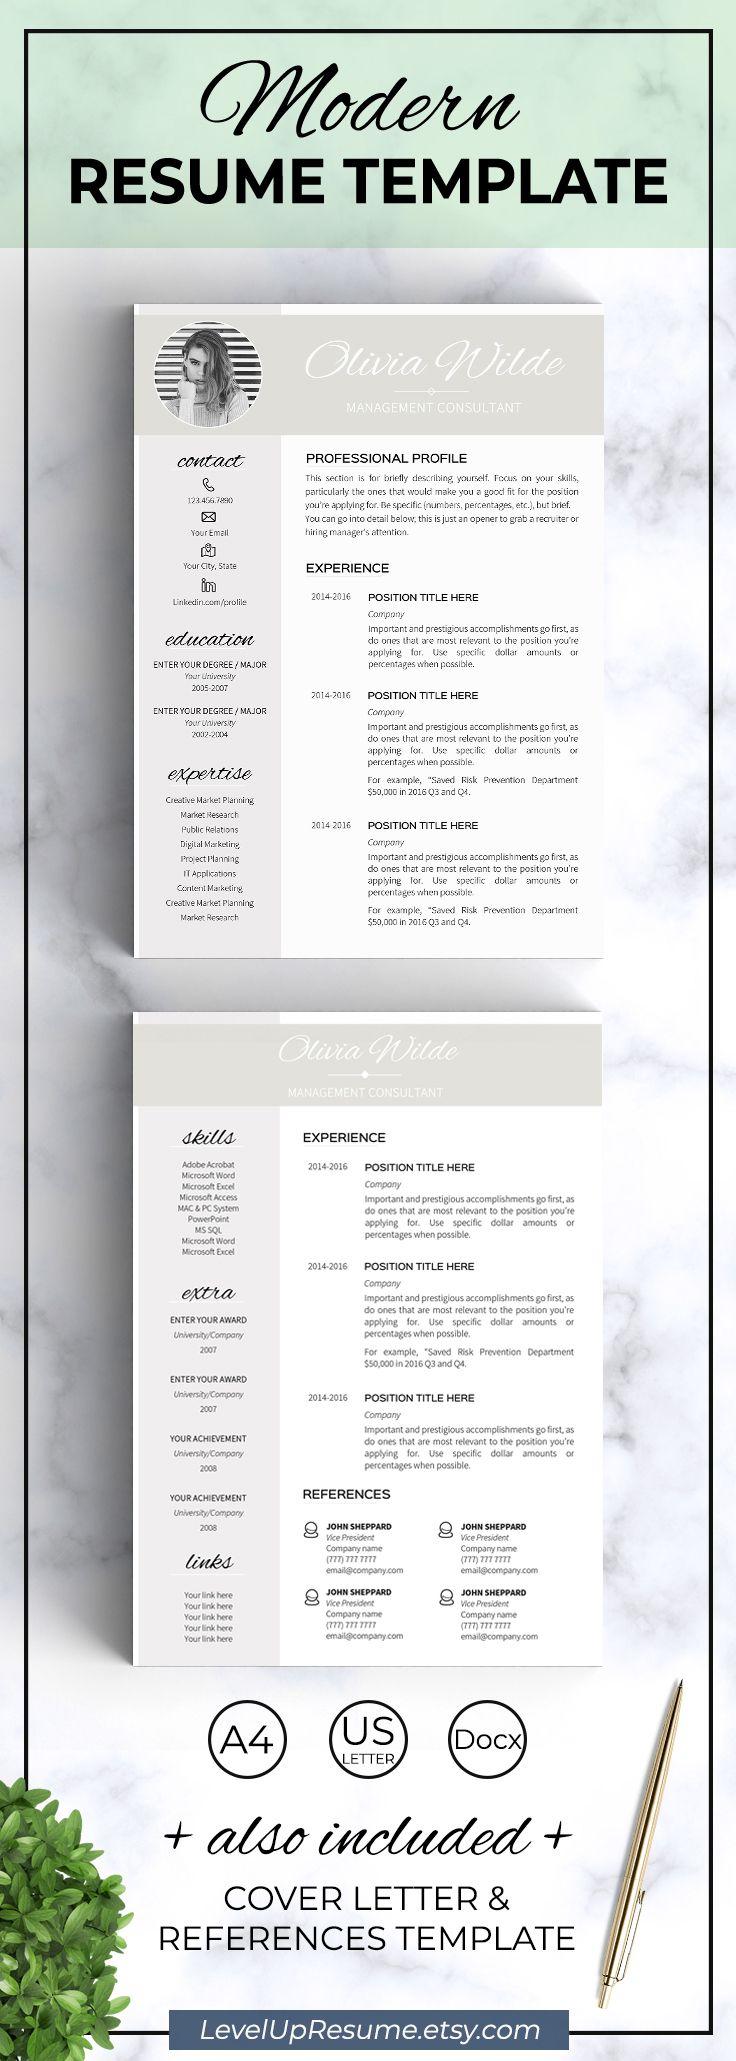 Modern Resume Template Professional Resume Design Career Advice